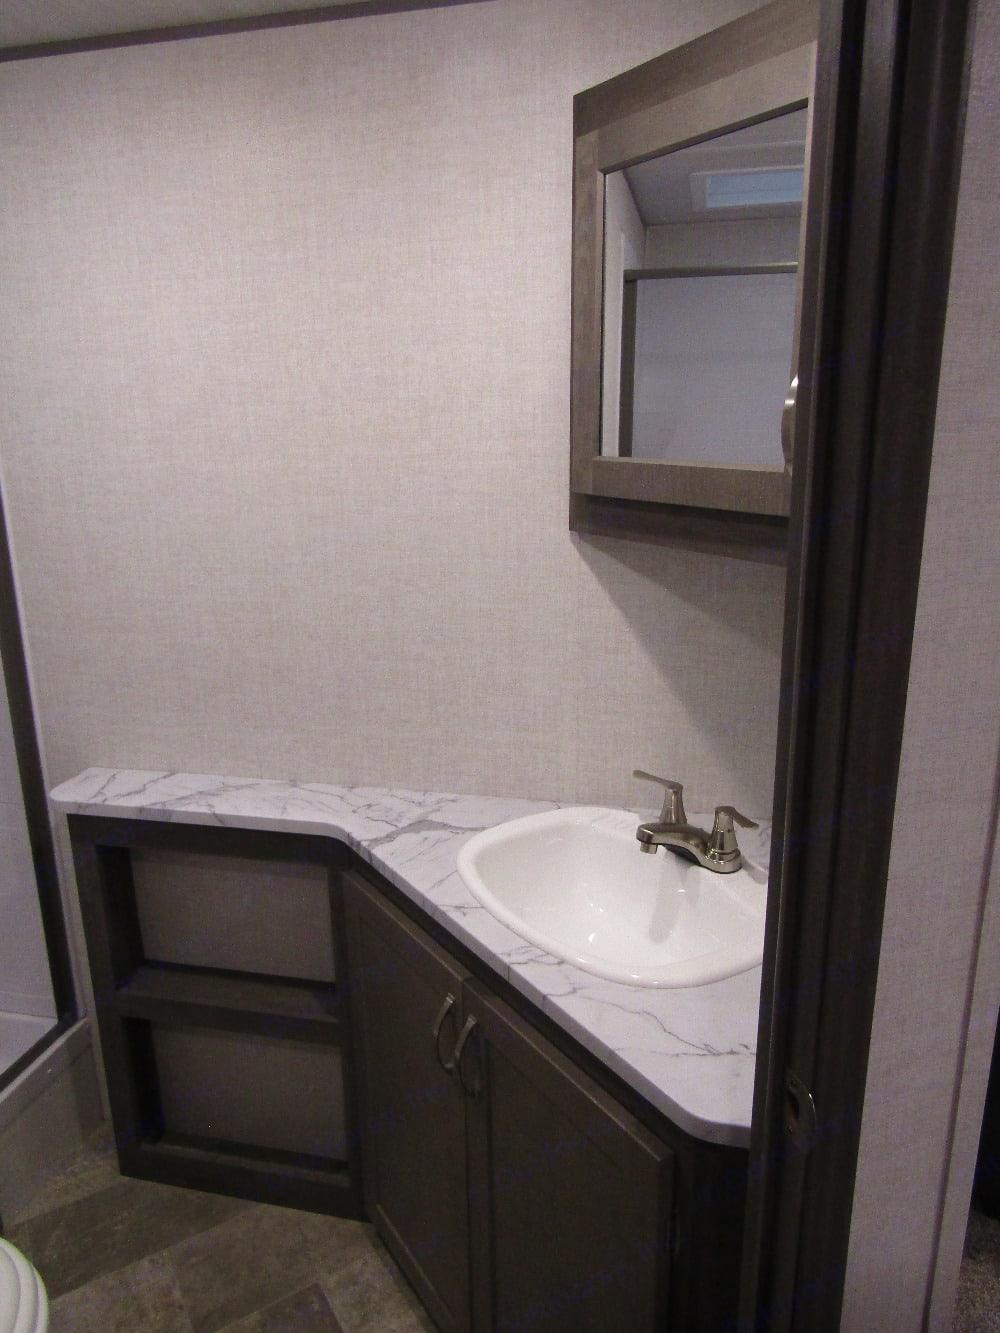 Bathroom sink and vanity.. Forest River East to West Ala 2800KBH 2021